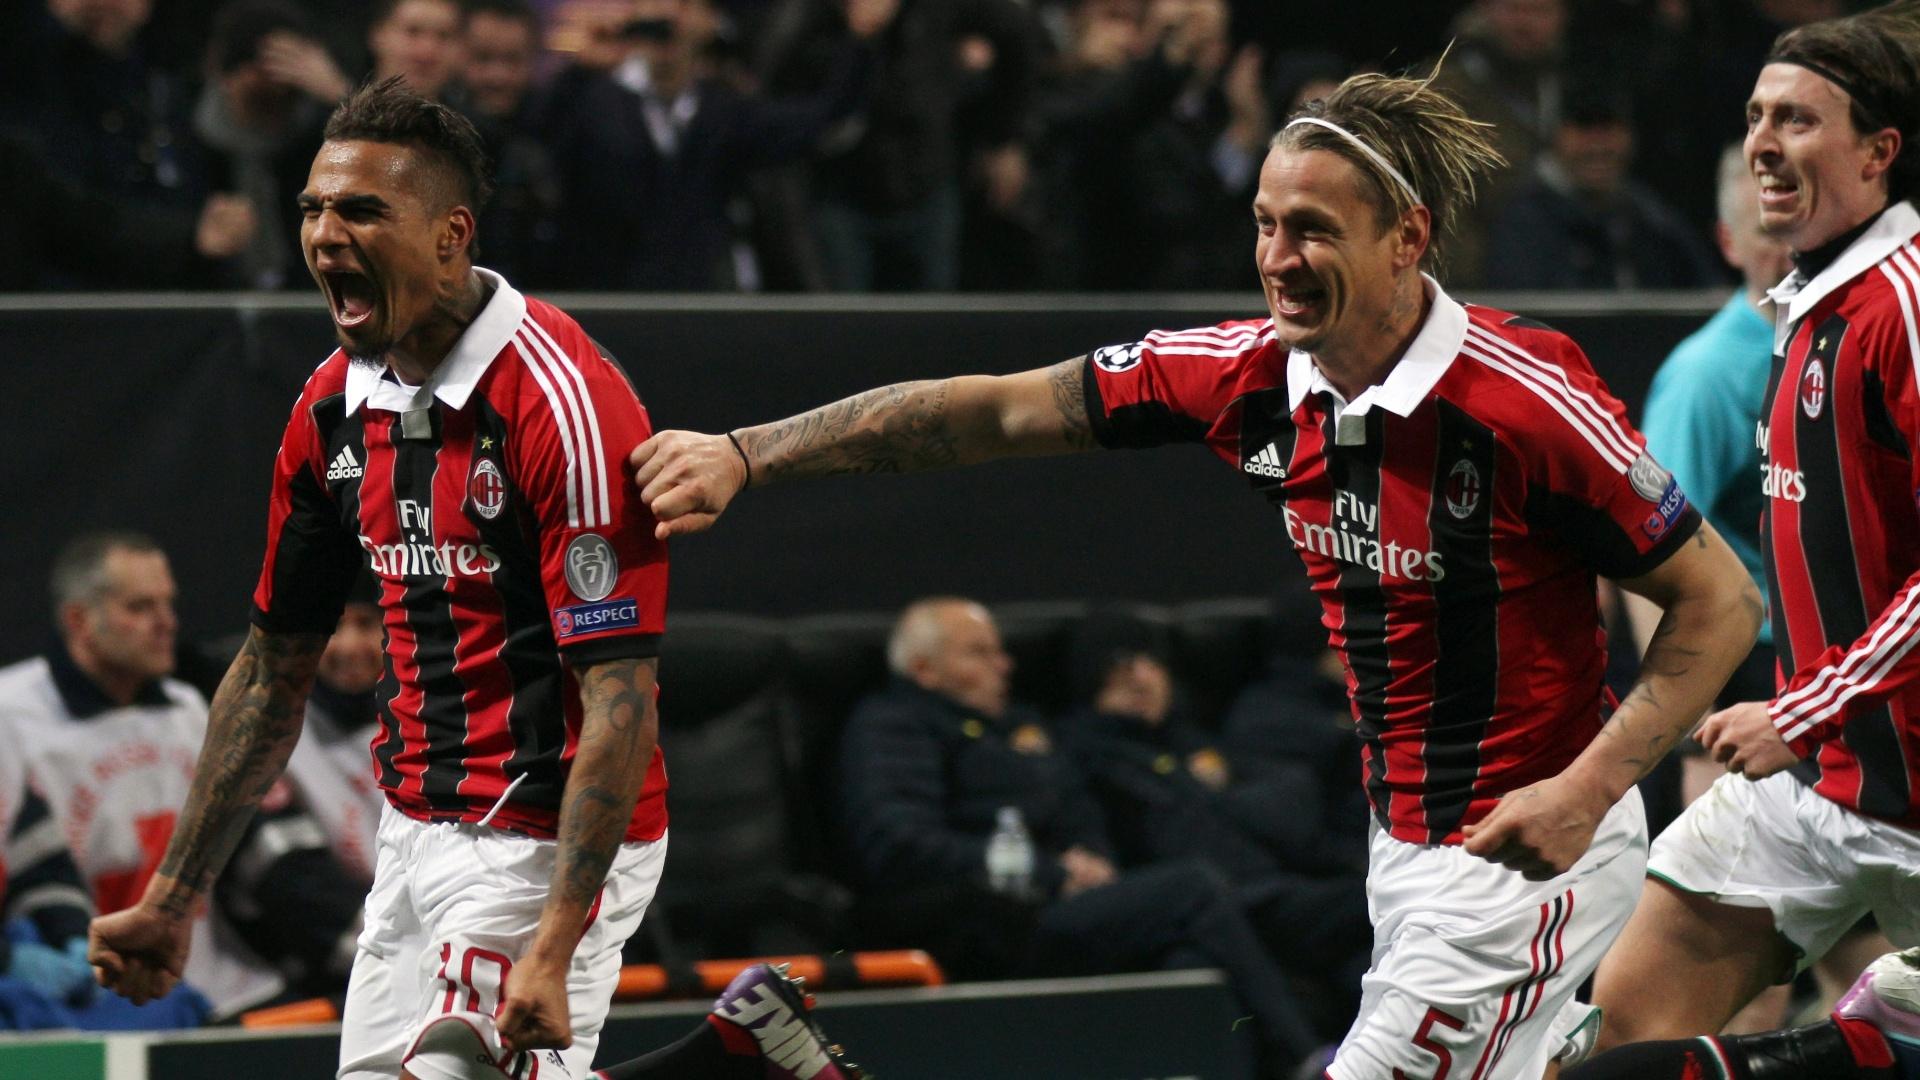 20.fev.2013 - Jogadores do Milan comemora gol de Boateng (à frente) contra o Barcelona